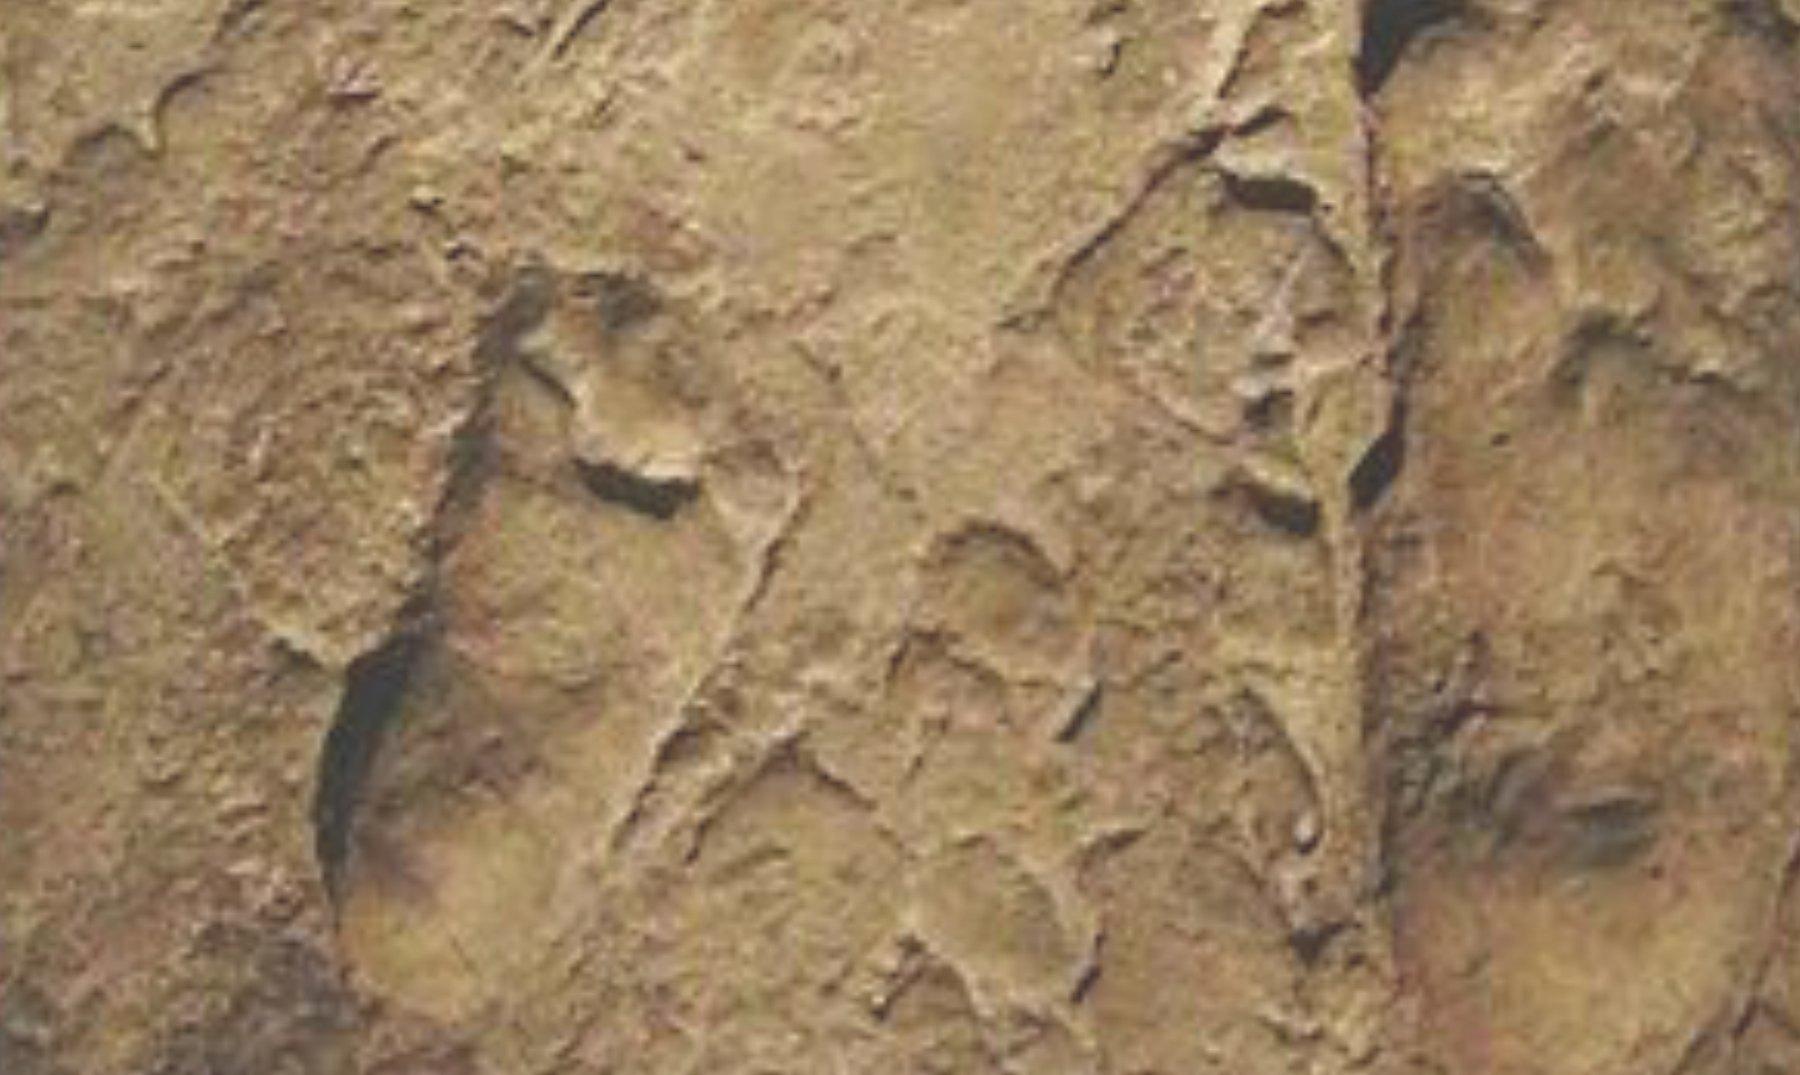 Laetoli footprints dating games